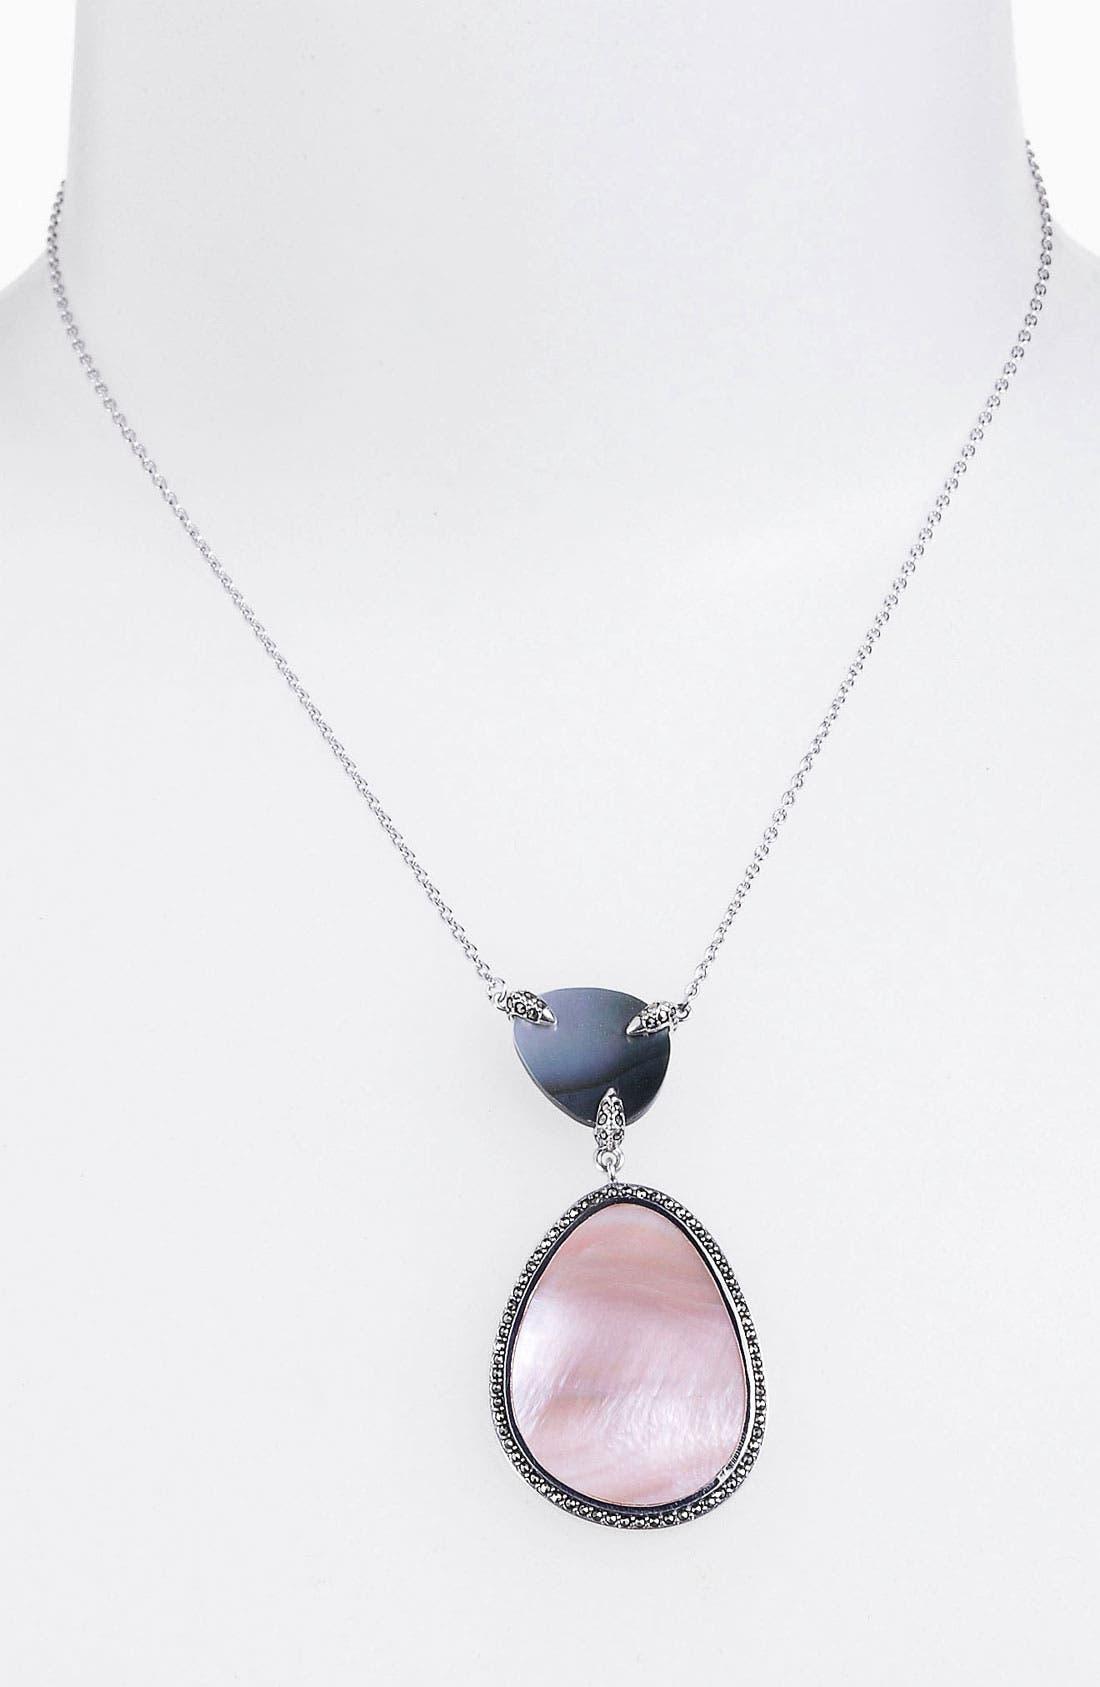 Main Image - Judith Jack Double Pendant Necklace